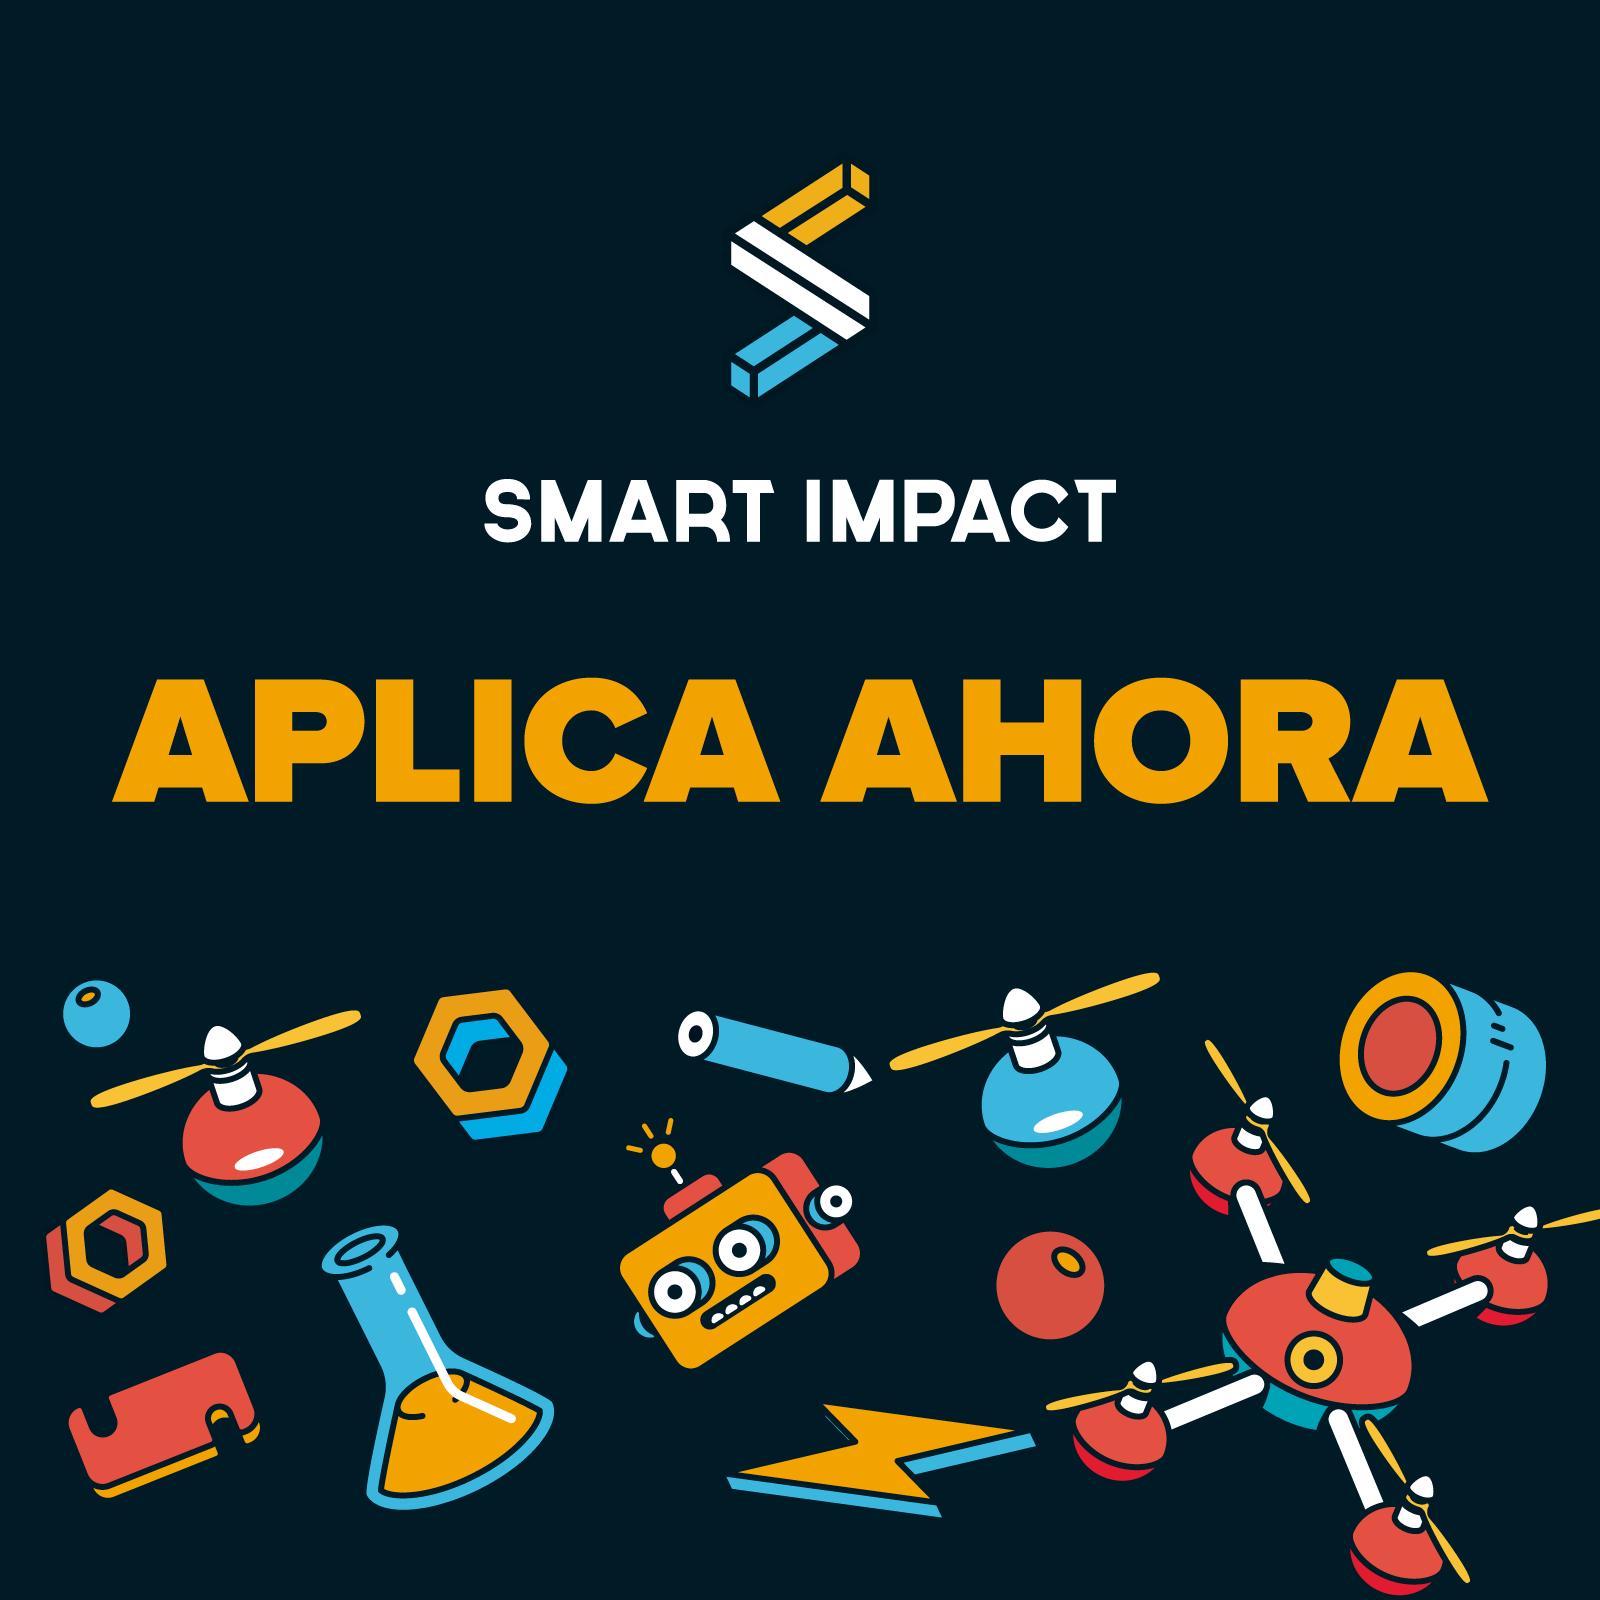 SMART IMPACT APLICA 2